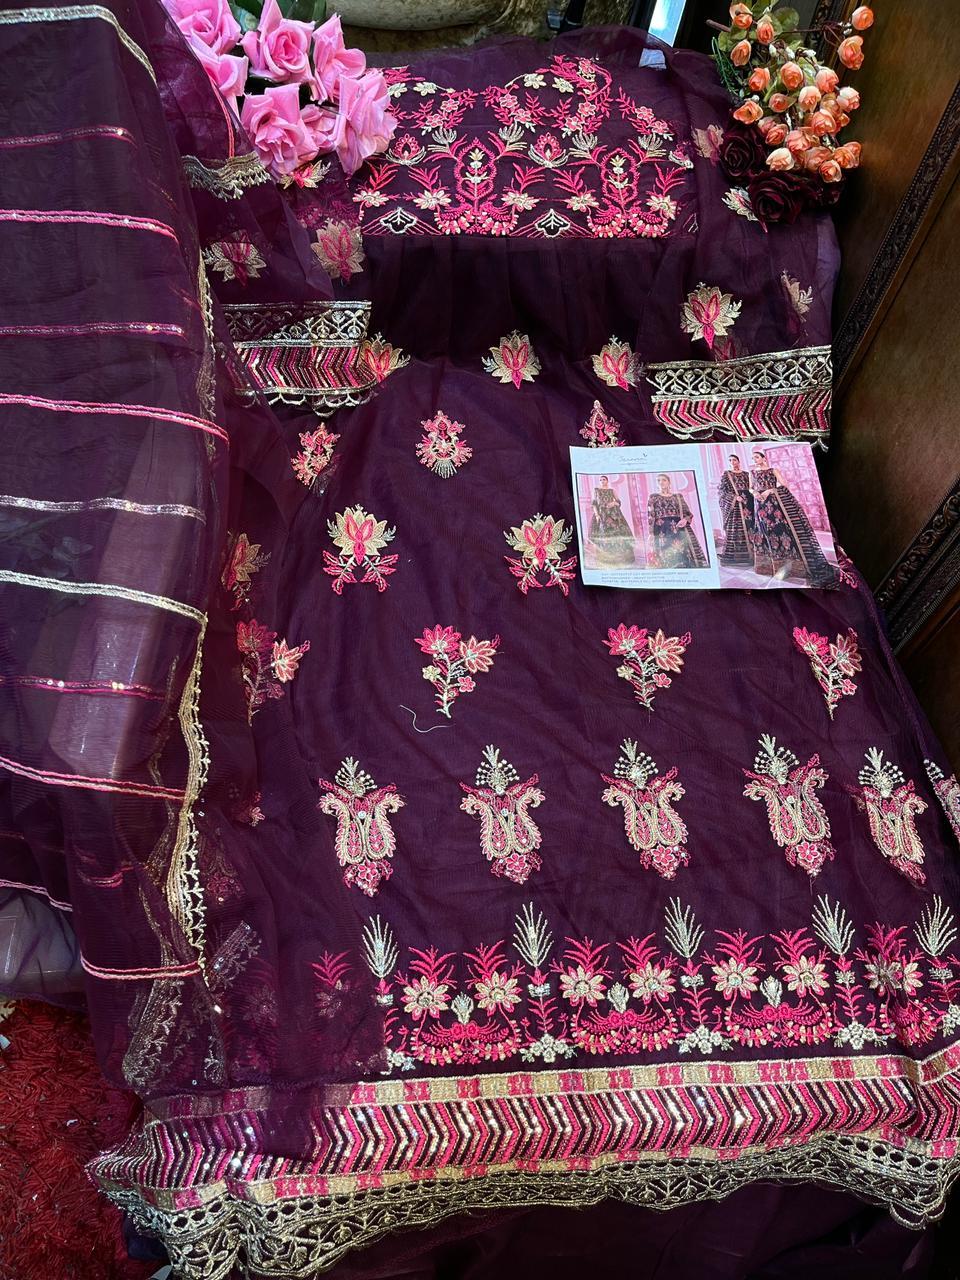 Serene Iznik Salwar Suit Wholesale Catalog 5 Pcs 8 - Serene Iznik Salwar Suit Wholesale Catalog 5 Pcs